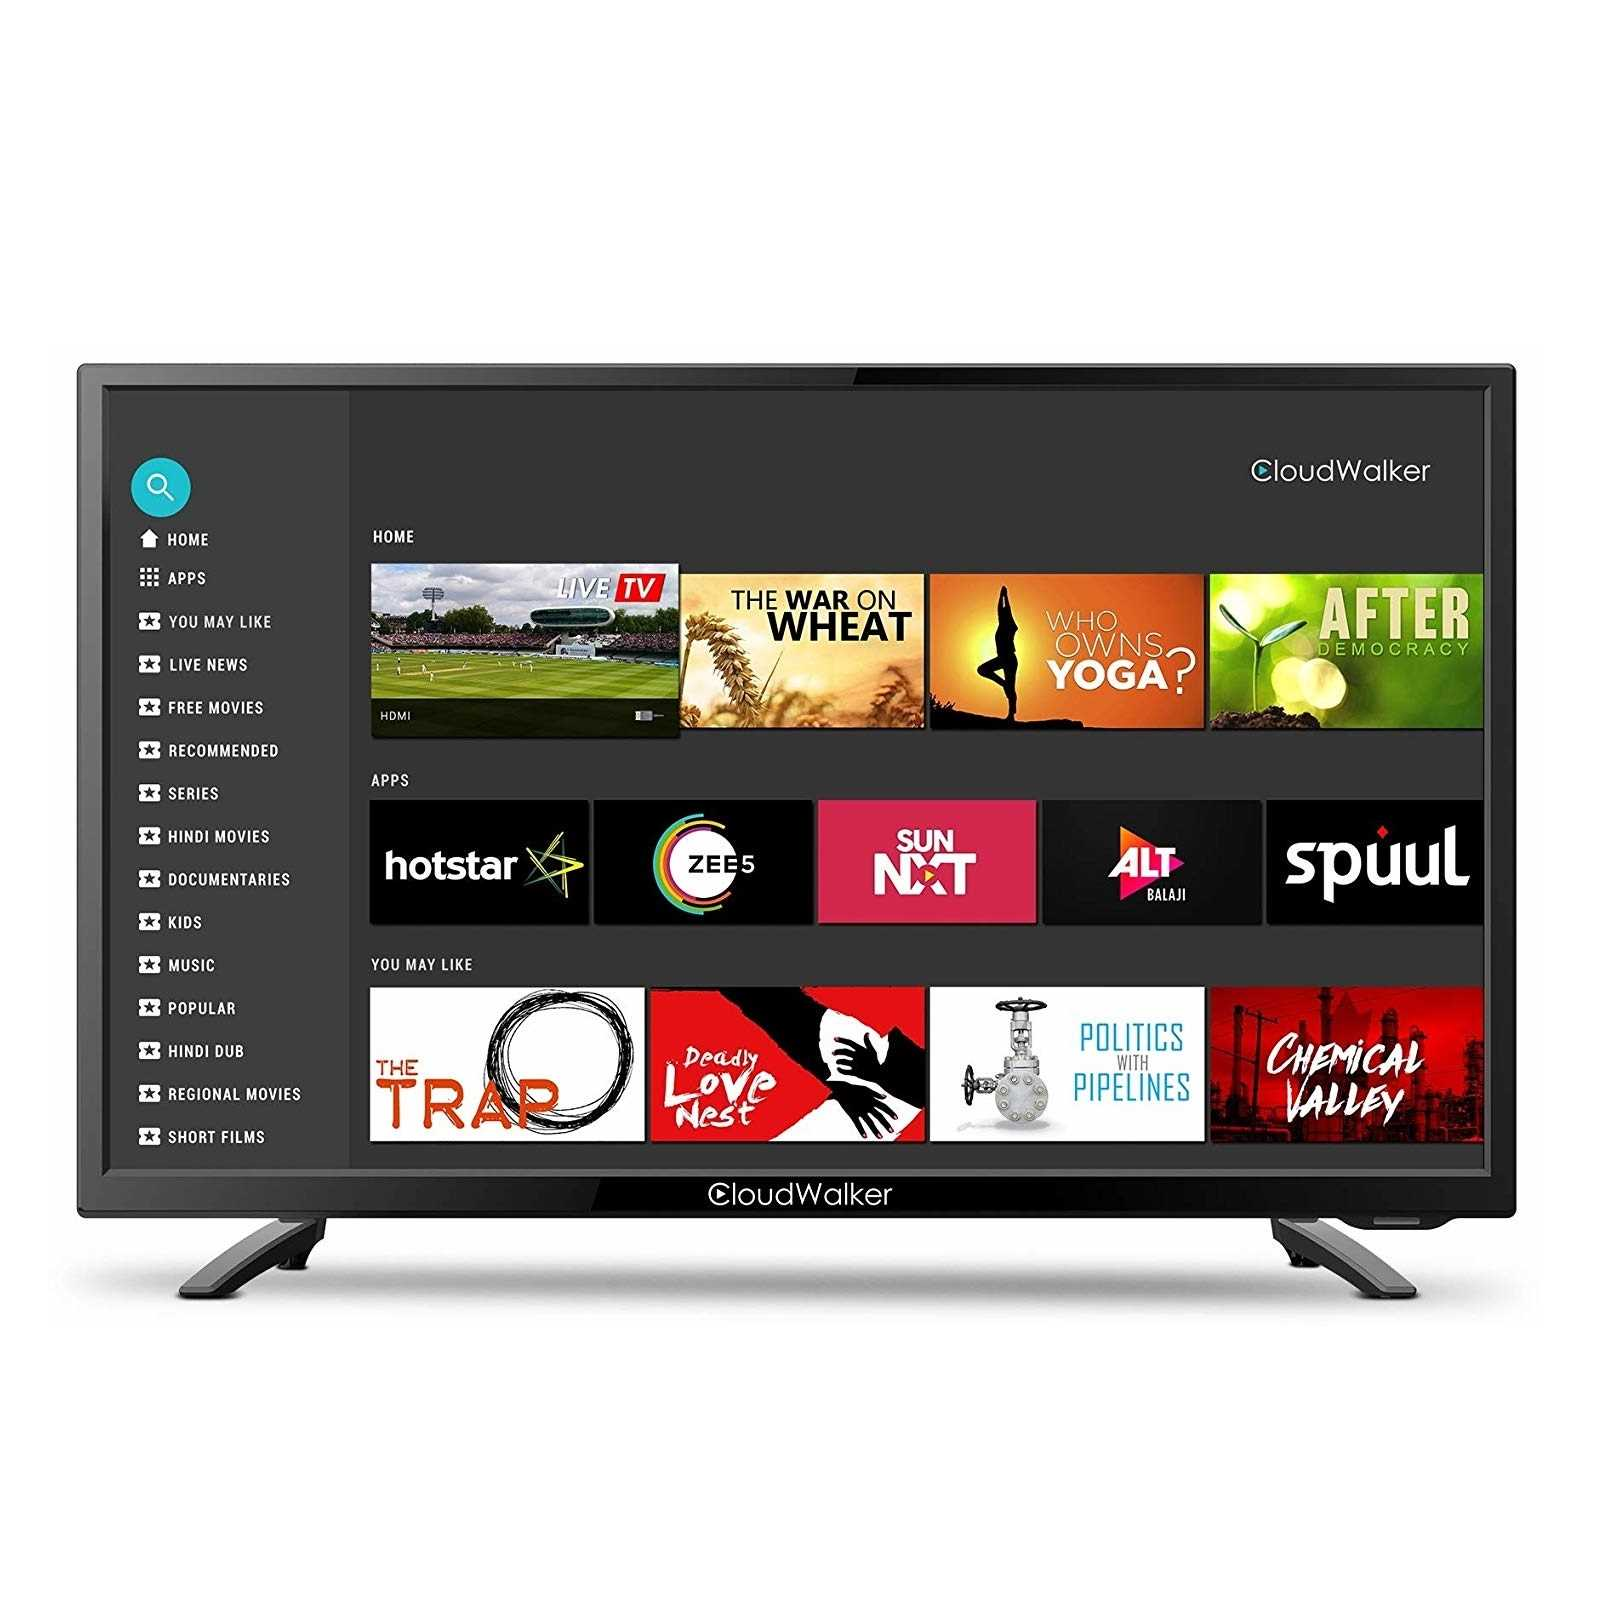 CloudWalker Cloud X3 32SHX3 32 Inch HD Ready Smart LED Television